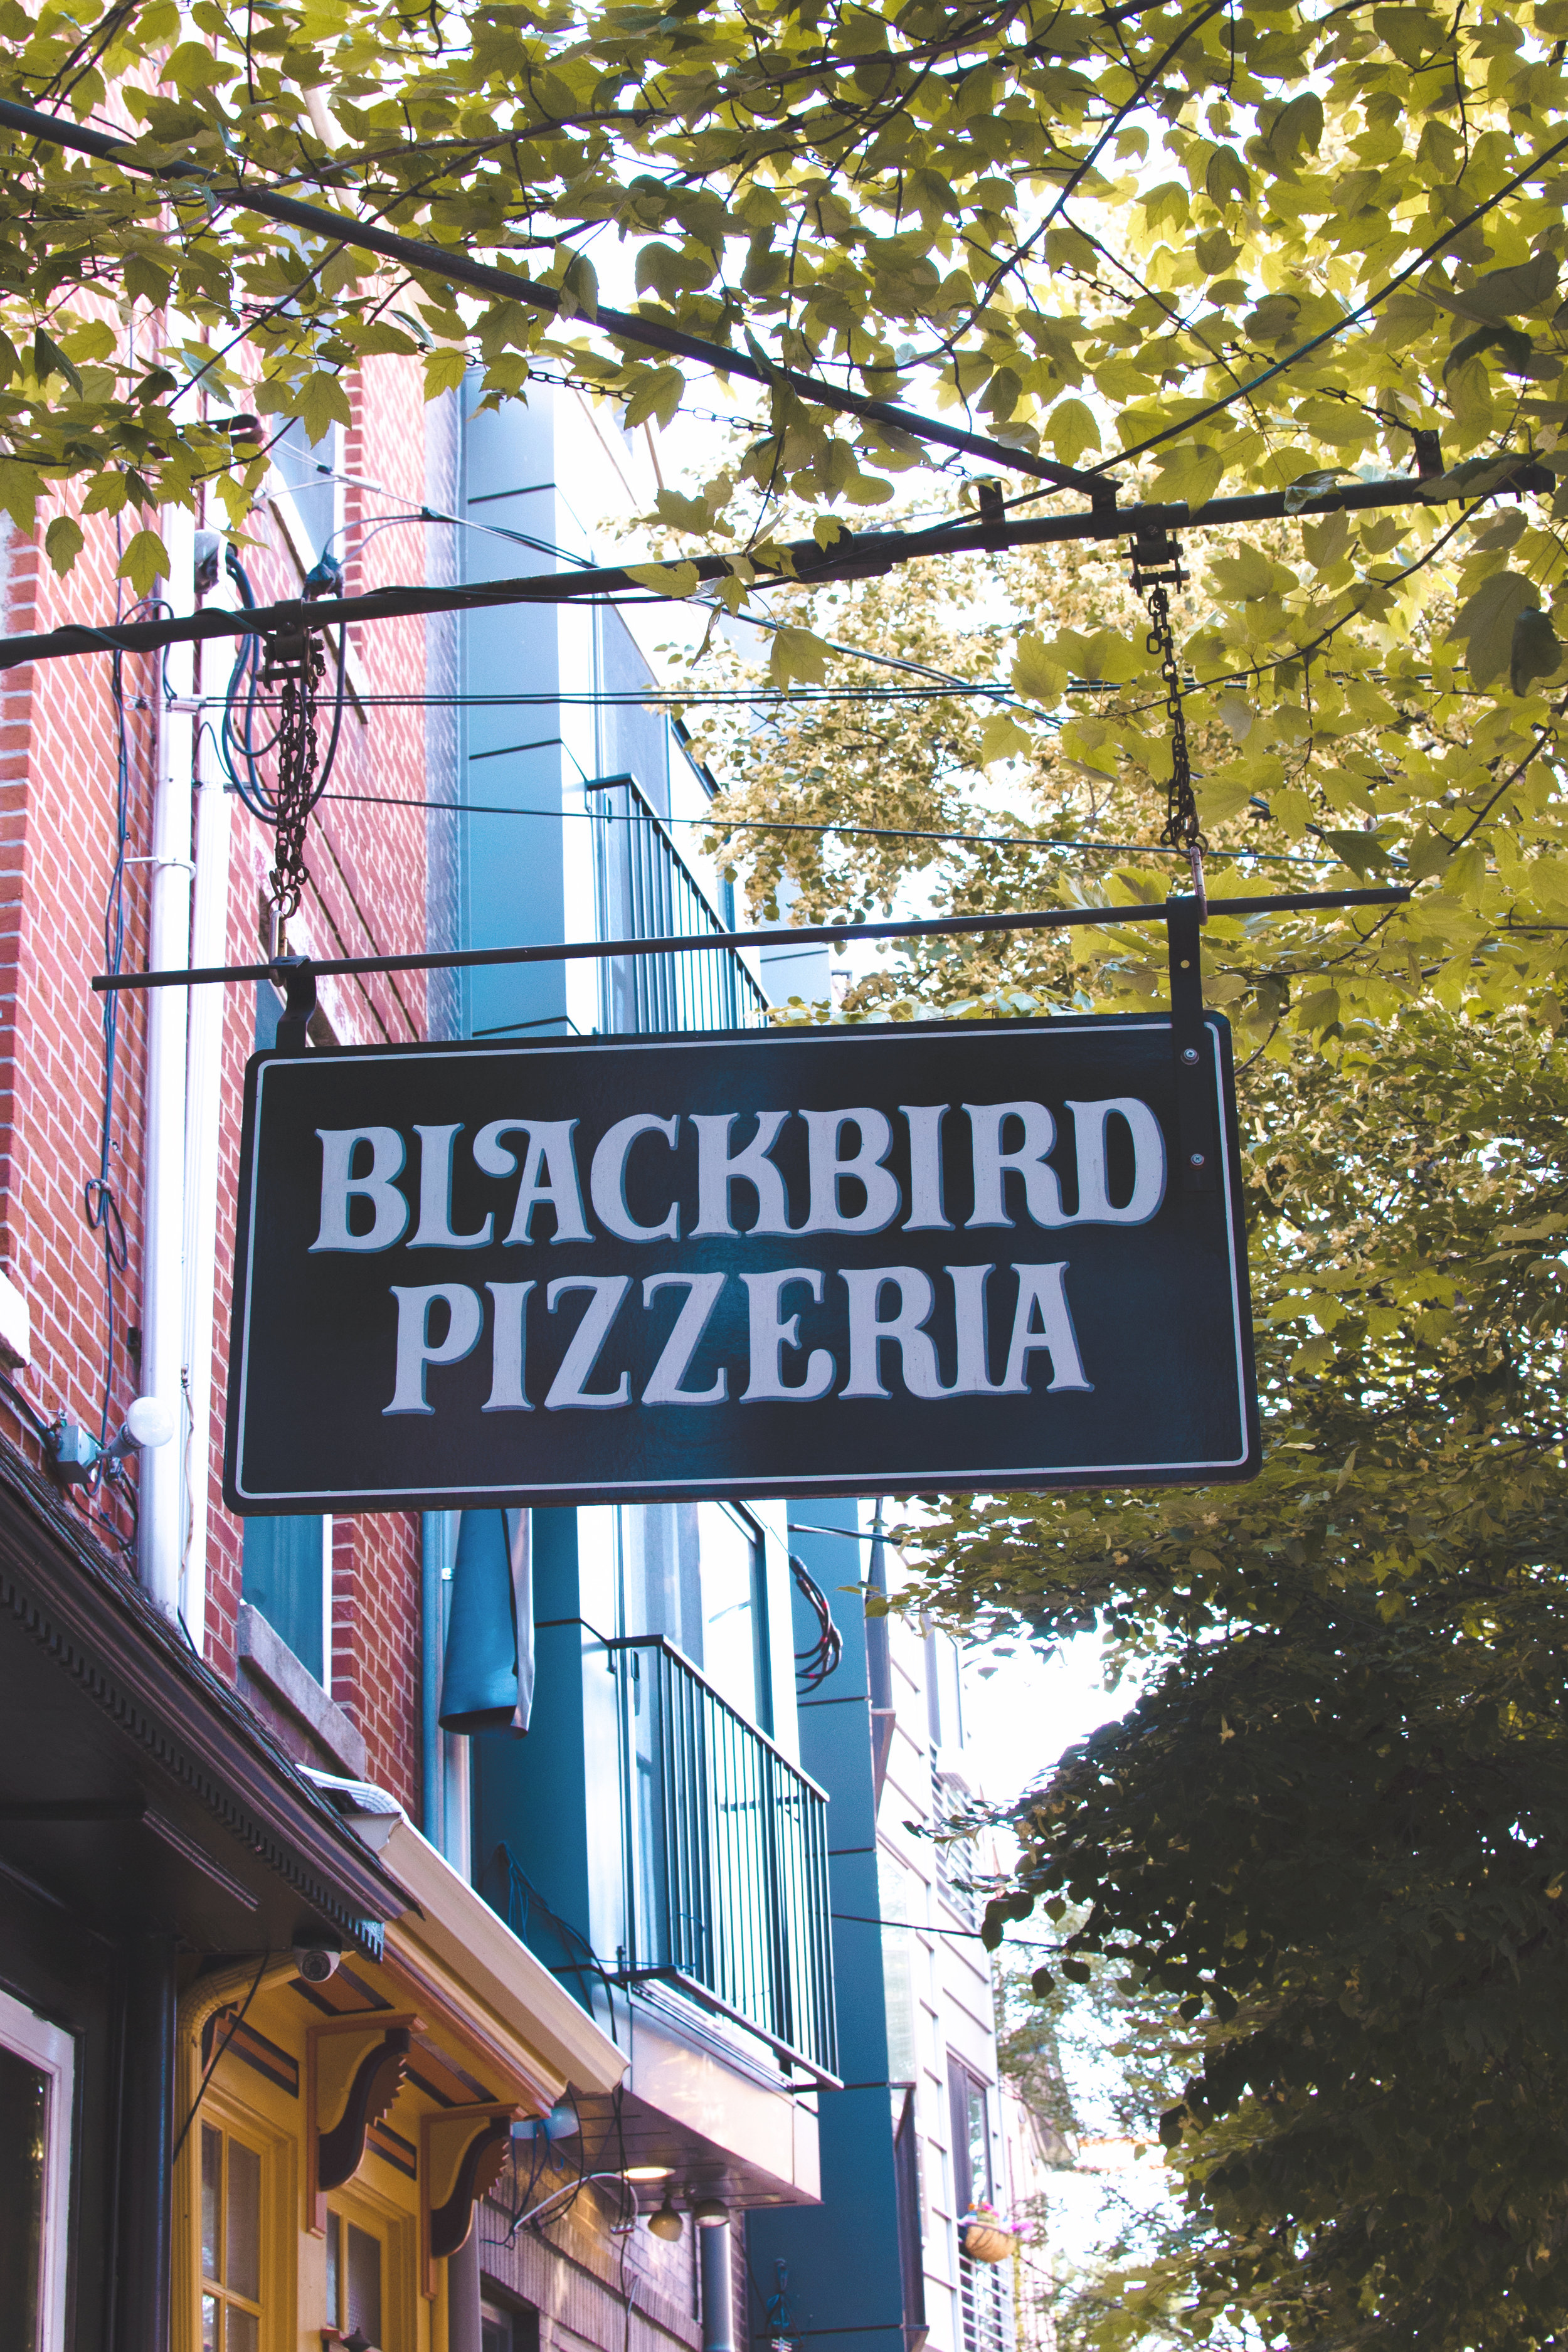 Blackbird-Pizzeria-Philadelphia-Vegan.jpg